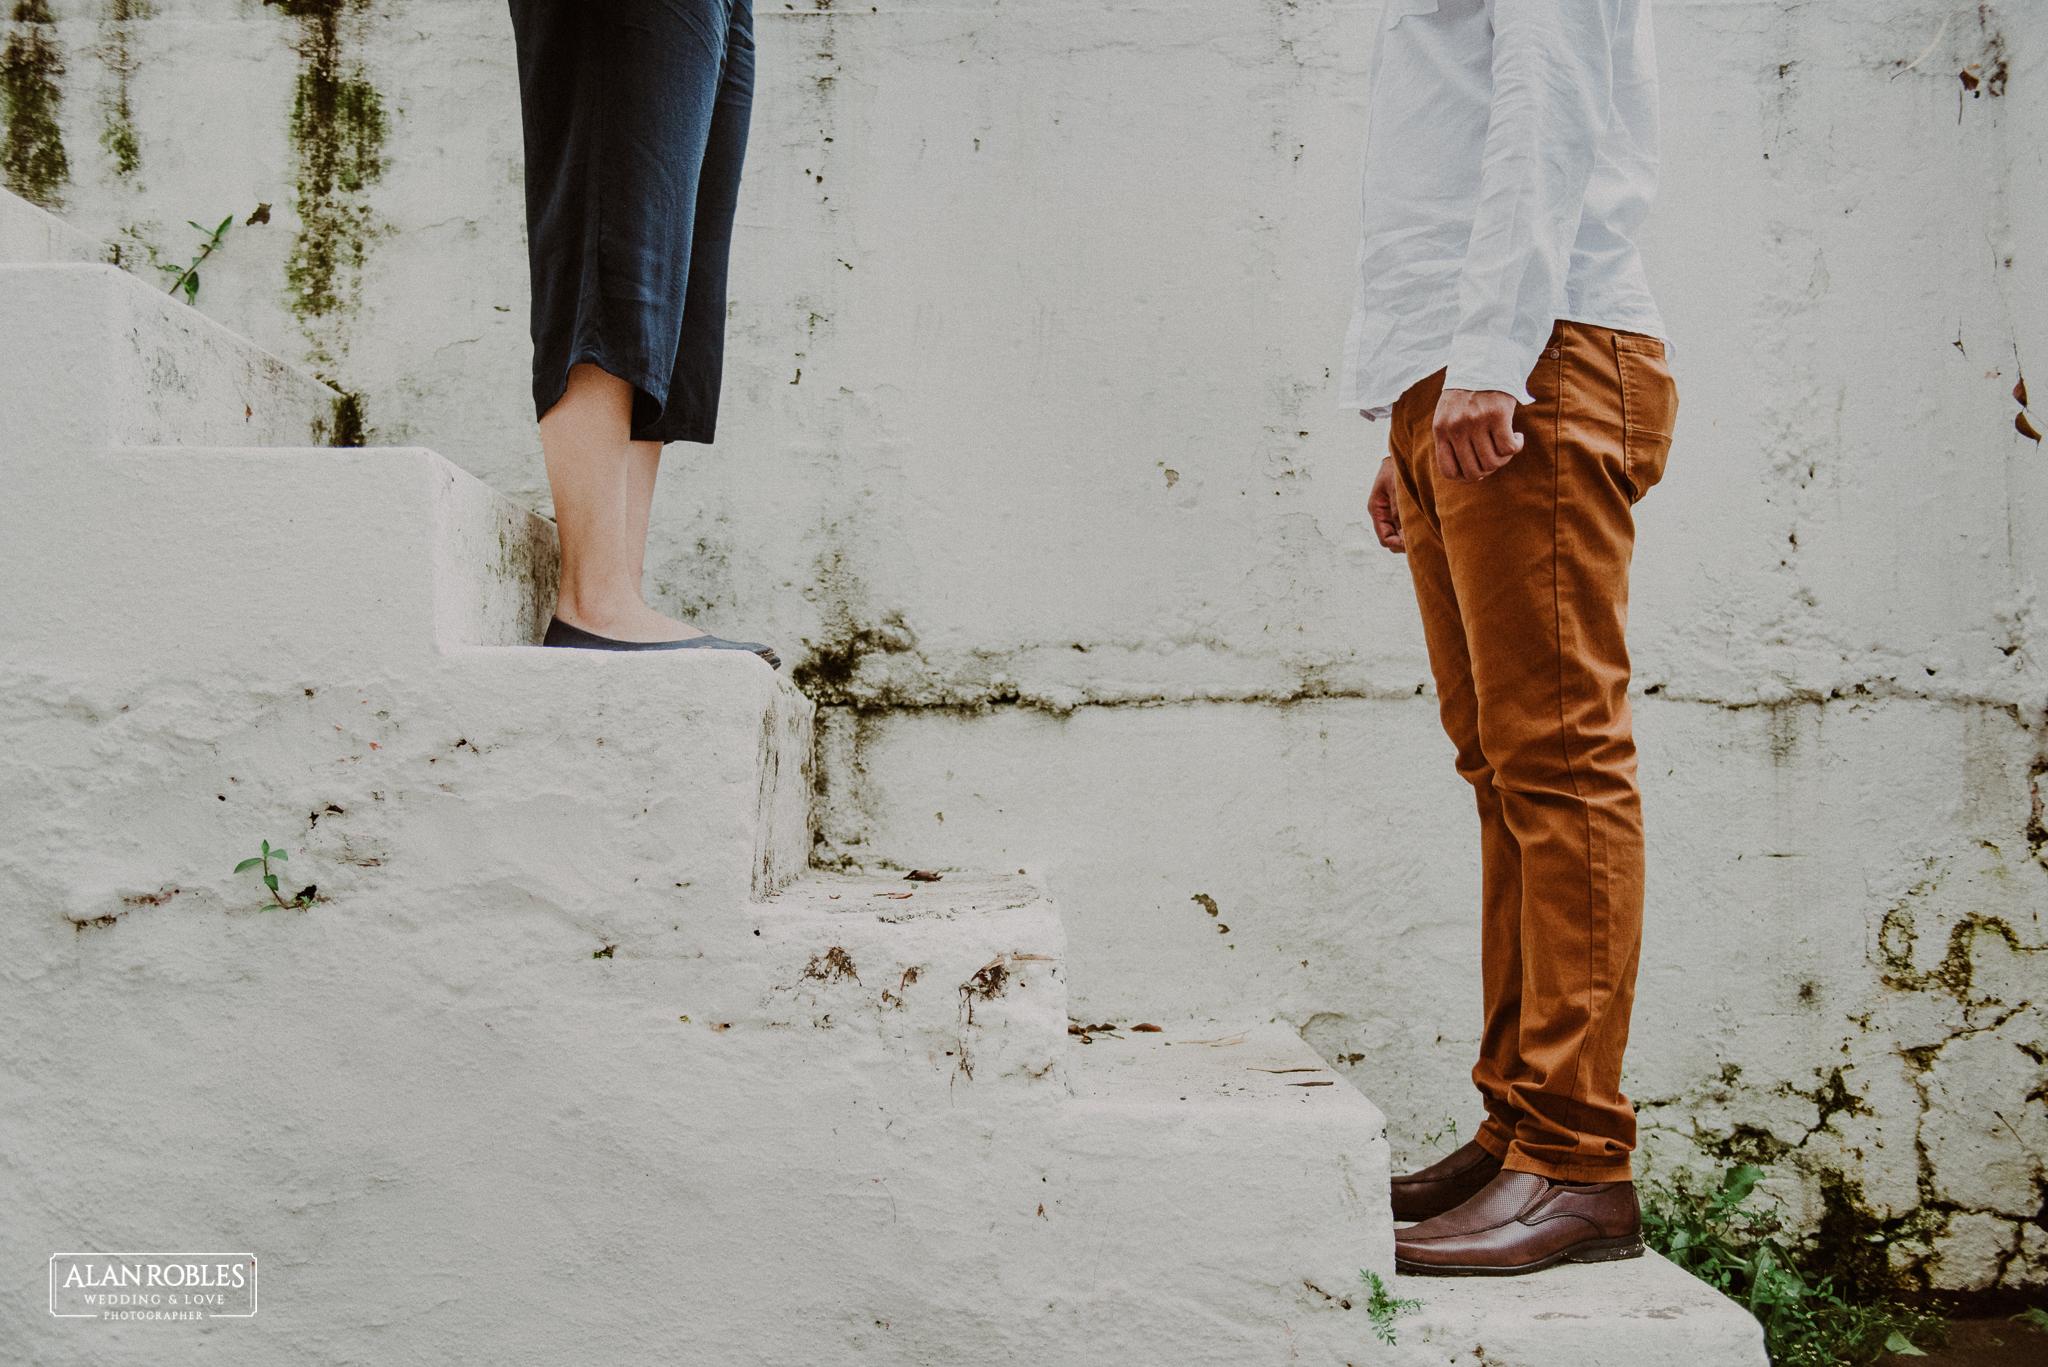 Sesion de fotos Preboda en Laguna de Chapala, Ajijic. Fotografia de bodas - Alan Robles Wedding & Love Photographer. Fotos creativas para boda. Ideas para fotos de boda. El mejor fotografo de bodas en Guadalajara.